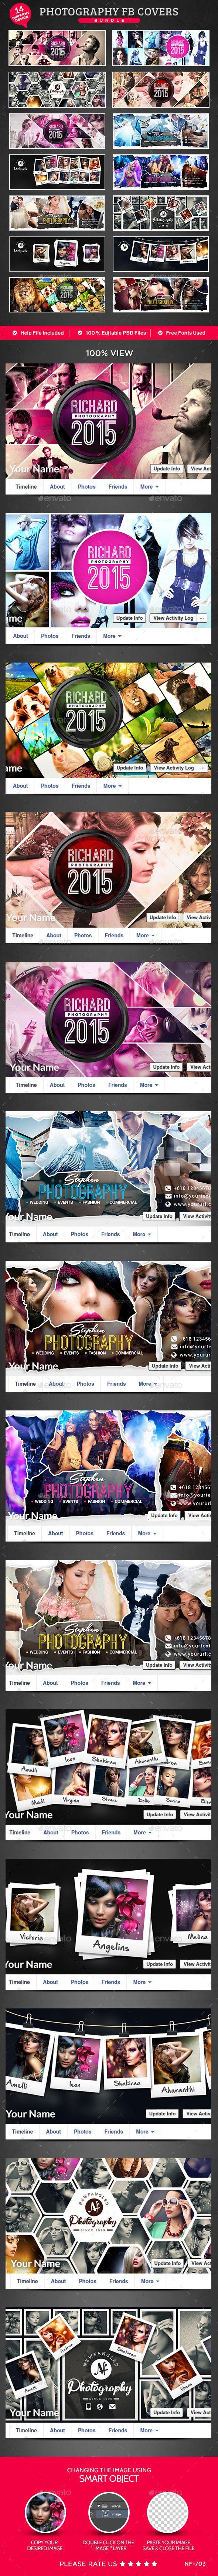 photography facebook cover bundle 14 designs template psd design